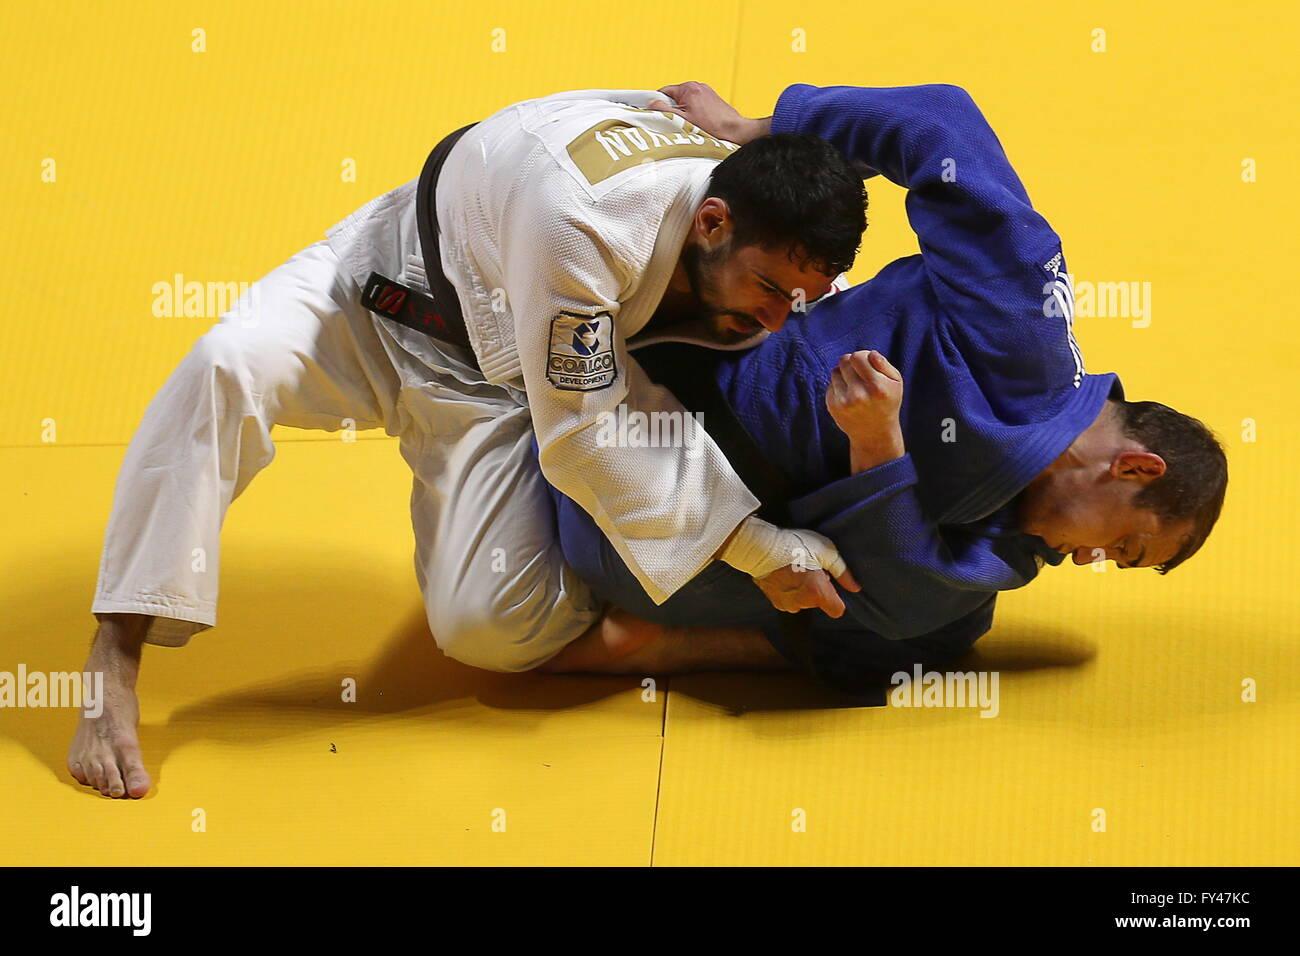 Kazan, Russie. Apr 21, 2016. Le judoka Russe Arsen Galstyan (L) et l'Ukrainien Khachatrian Gevorg judoka en Photo Stock